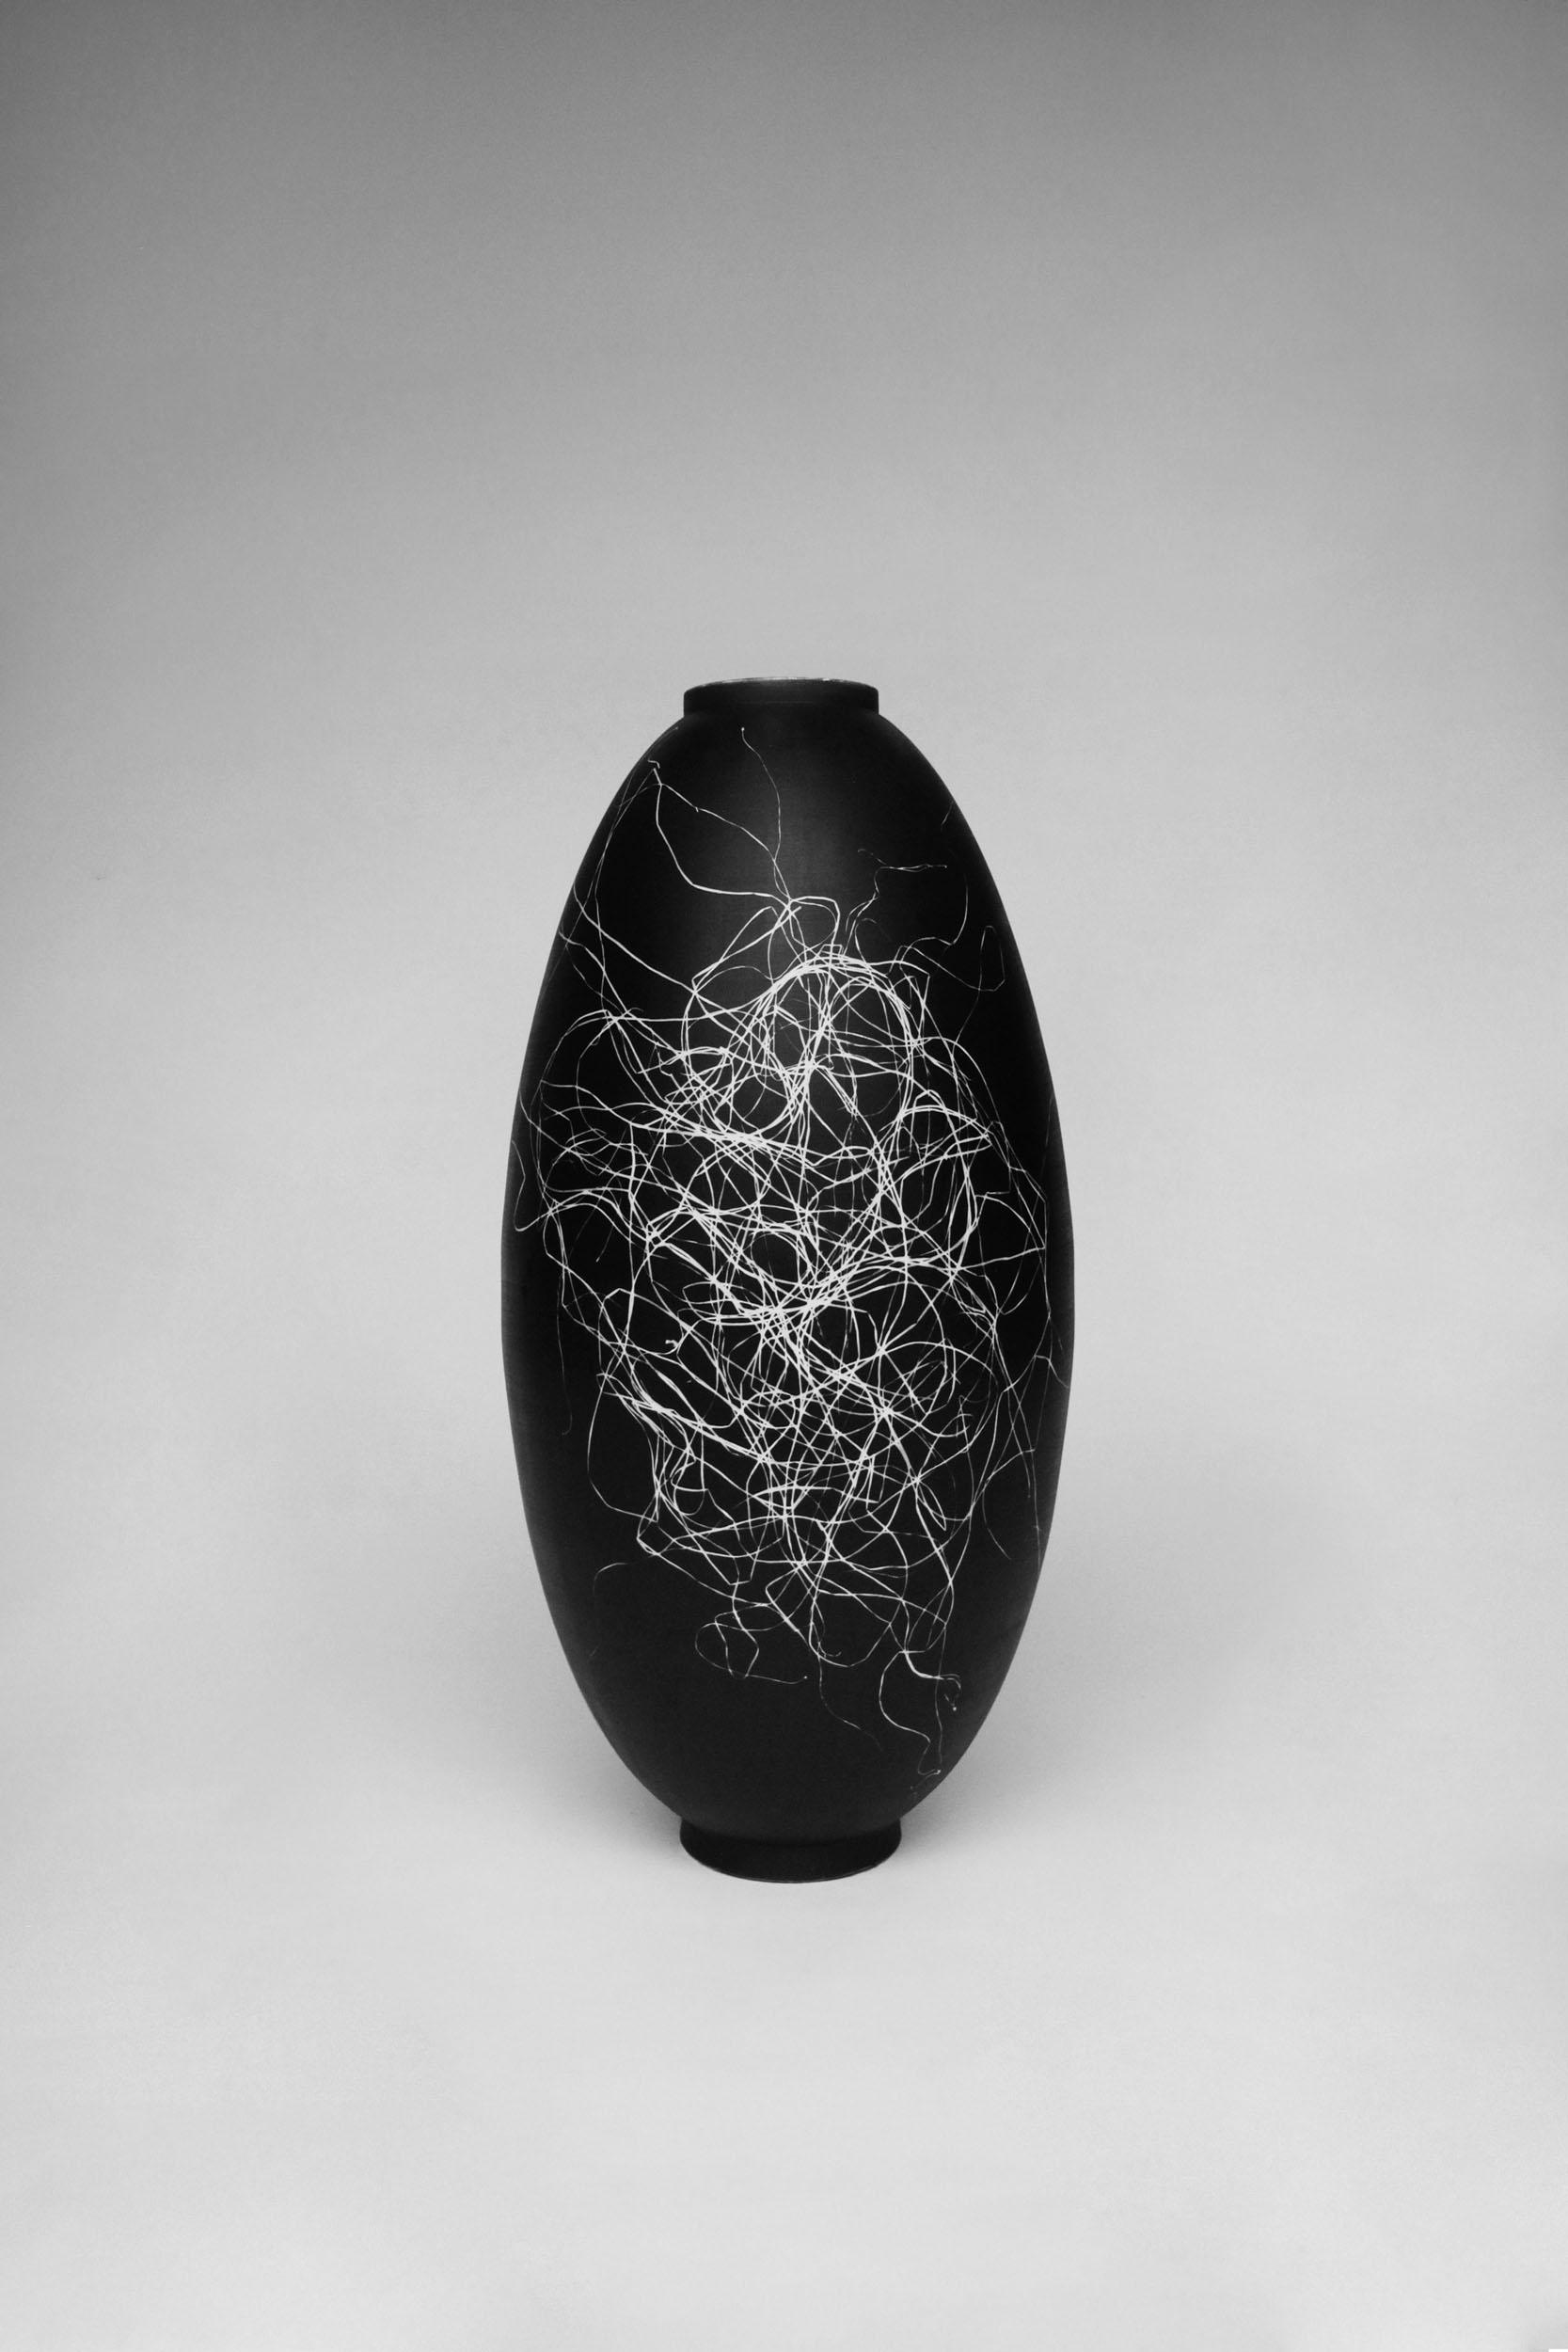 A tall Silverware vase with silver gelatin sea spaghetti photogram